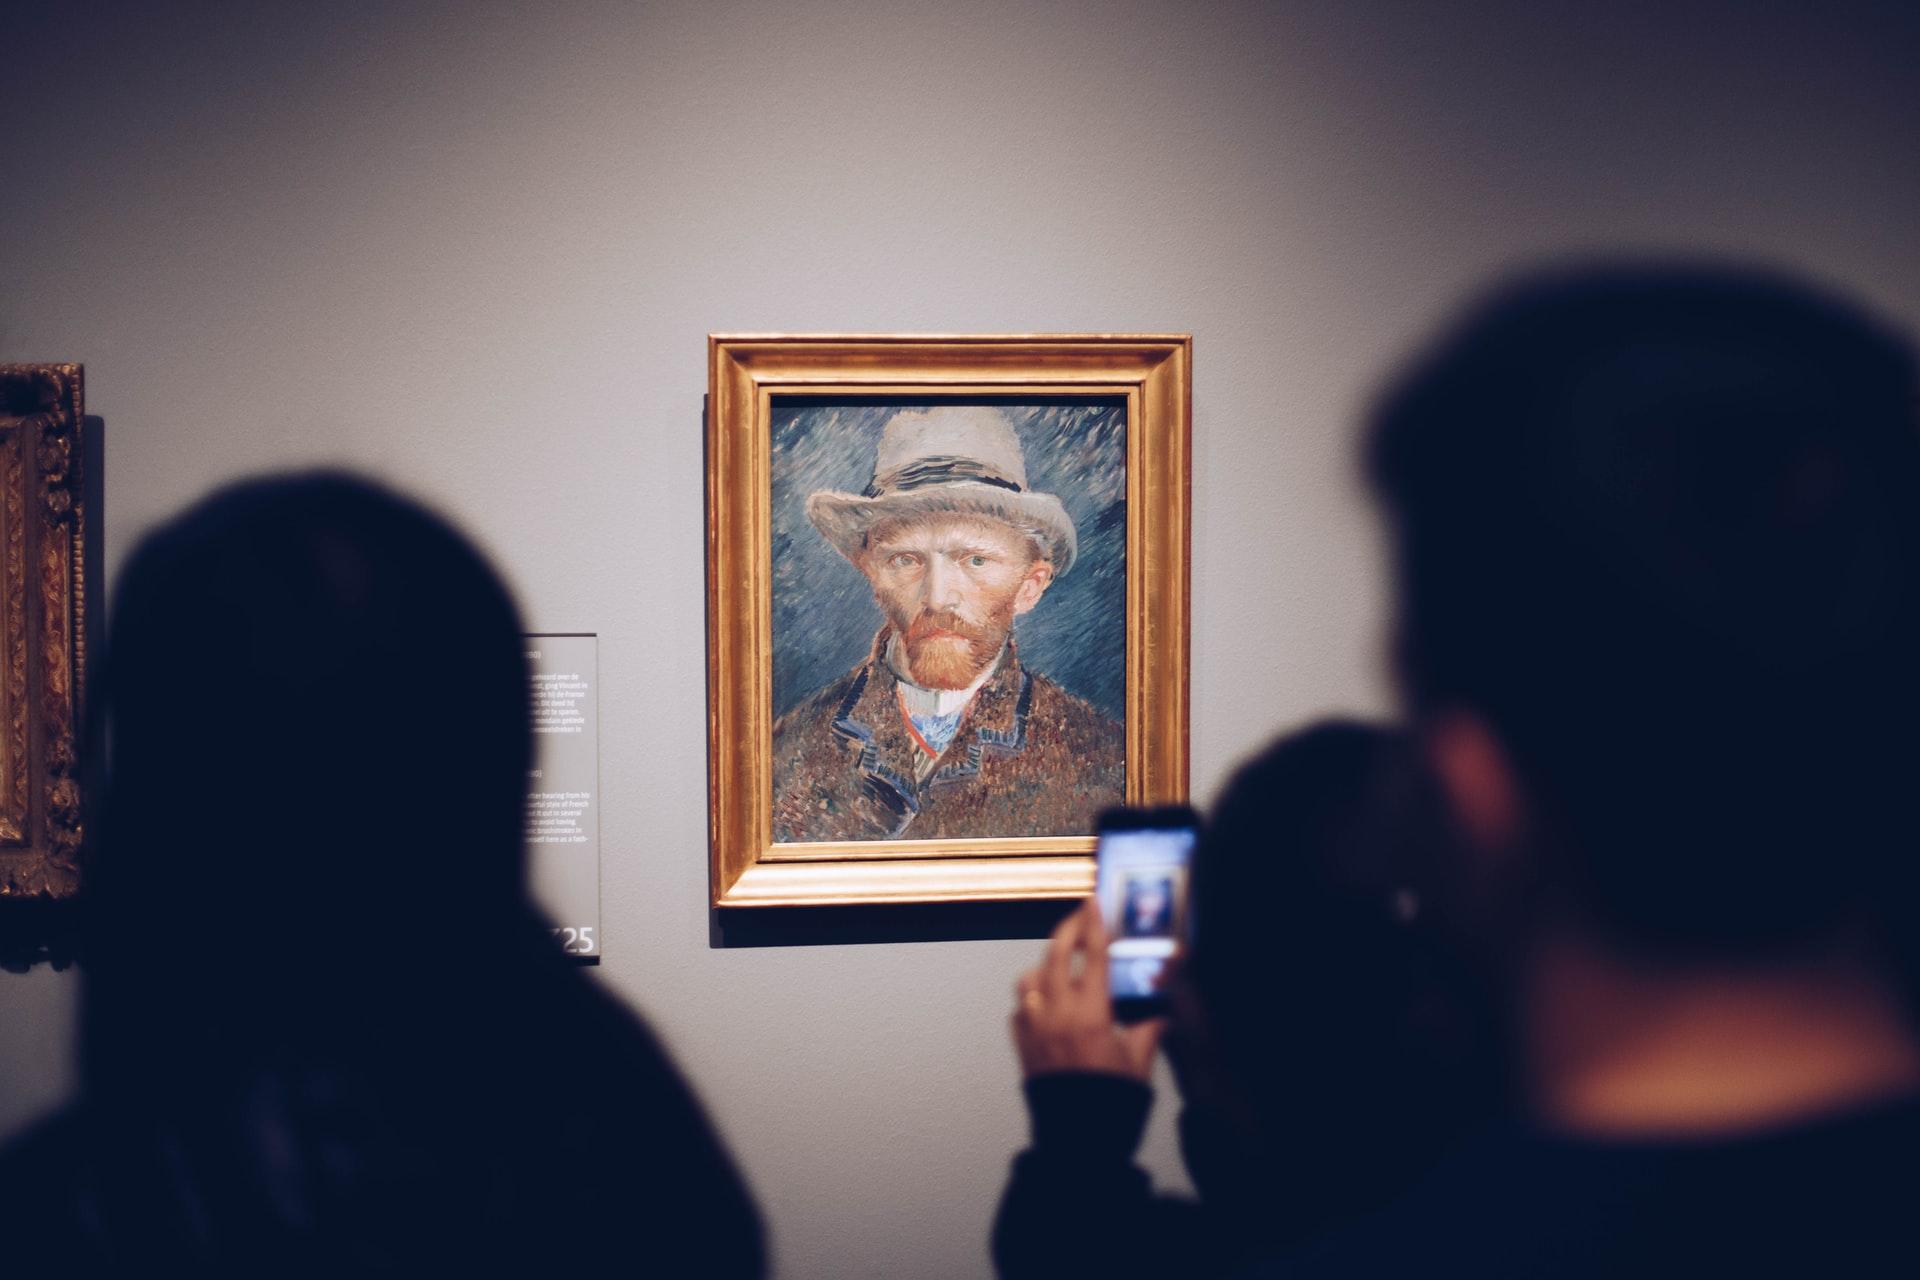 Van Gogh Painting Stolen From Dutch Museum Closed For Coronavirus Pandemic